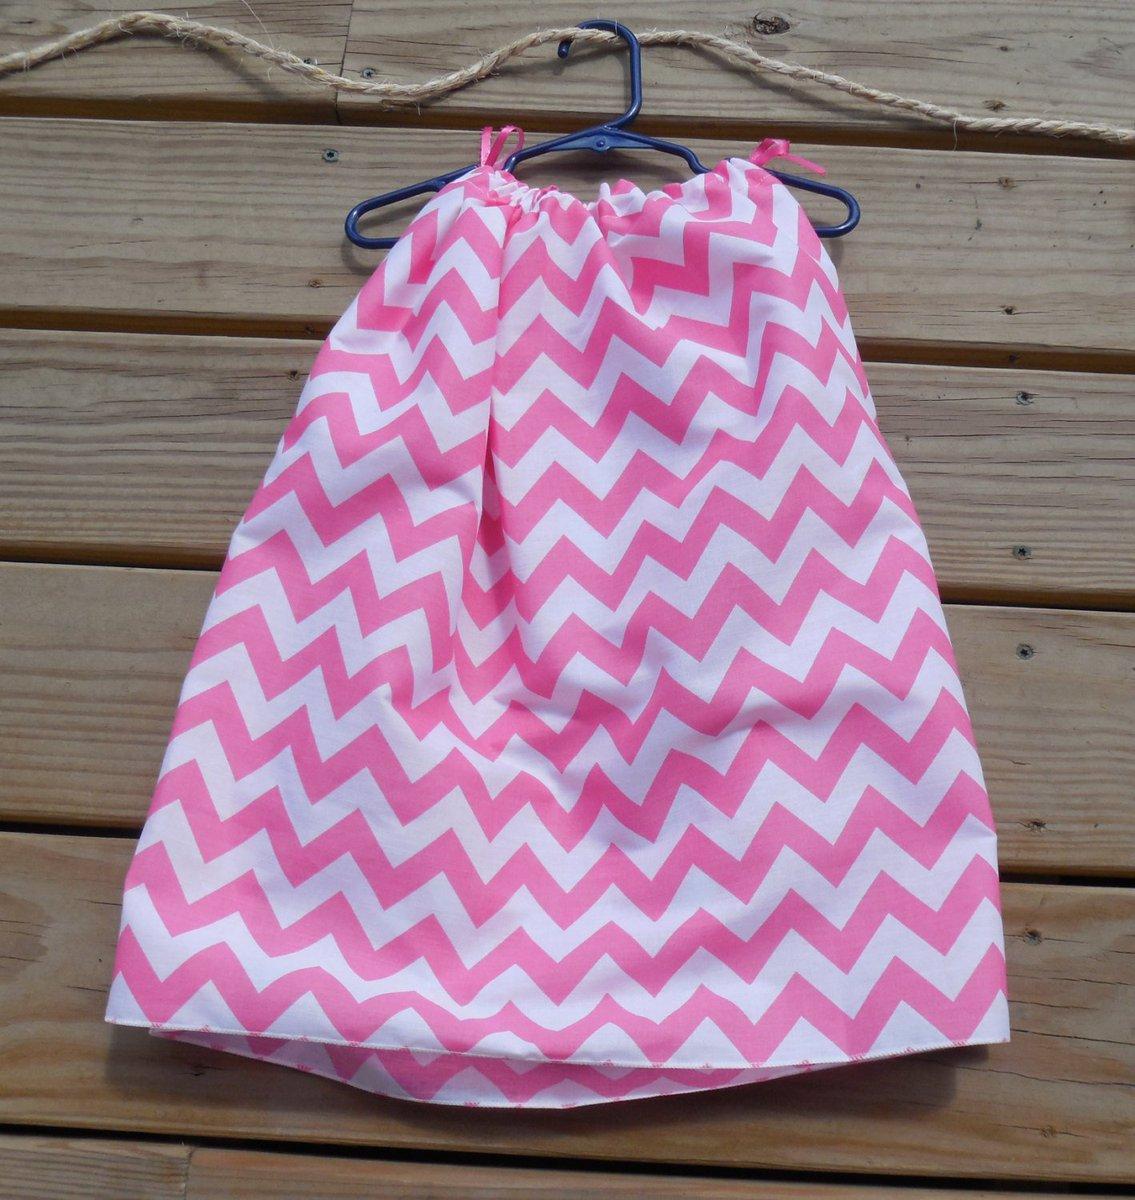 CLEARANCE Girls Pillowcase Dress Pink and White Chevron Print wit…  http:// tuppu.net/49395770  &nbsp;   #GabbysQuilts #EpicOnEtsy <br>http://pic.twitter.com/0LInTI82Hl